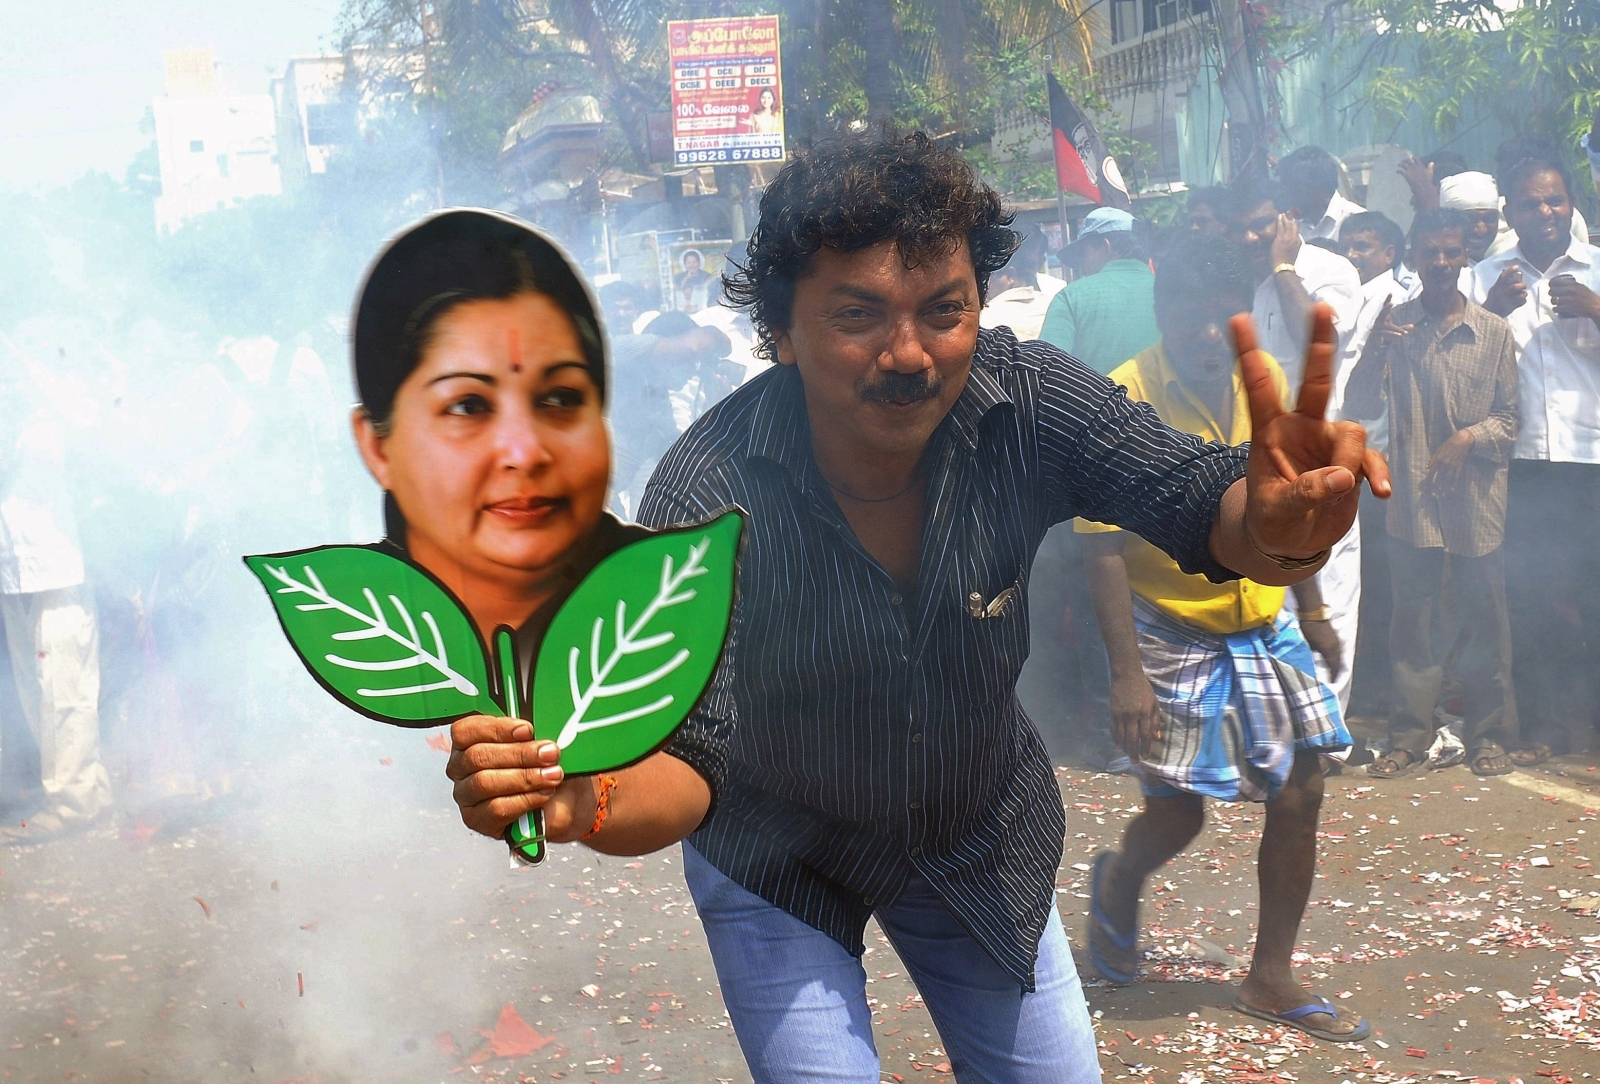 Former Tamil Nadu chief minister Jayalalithaa Jayaraman given bail